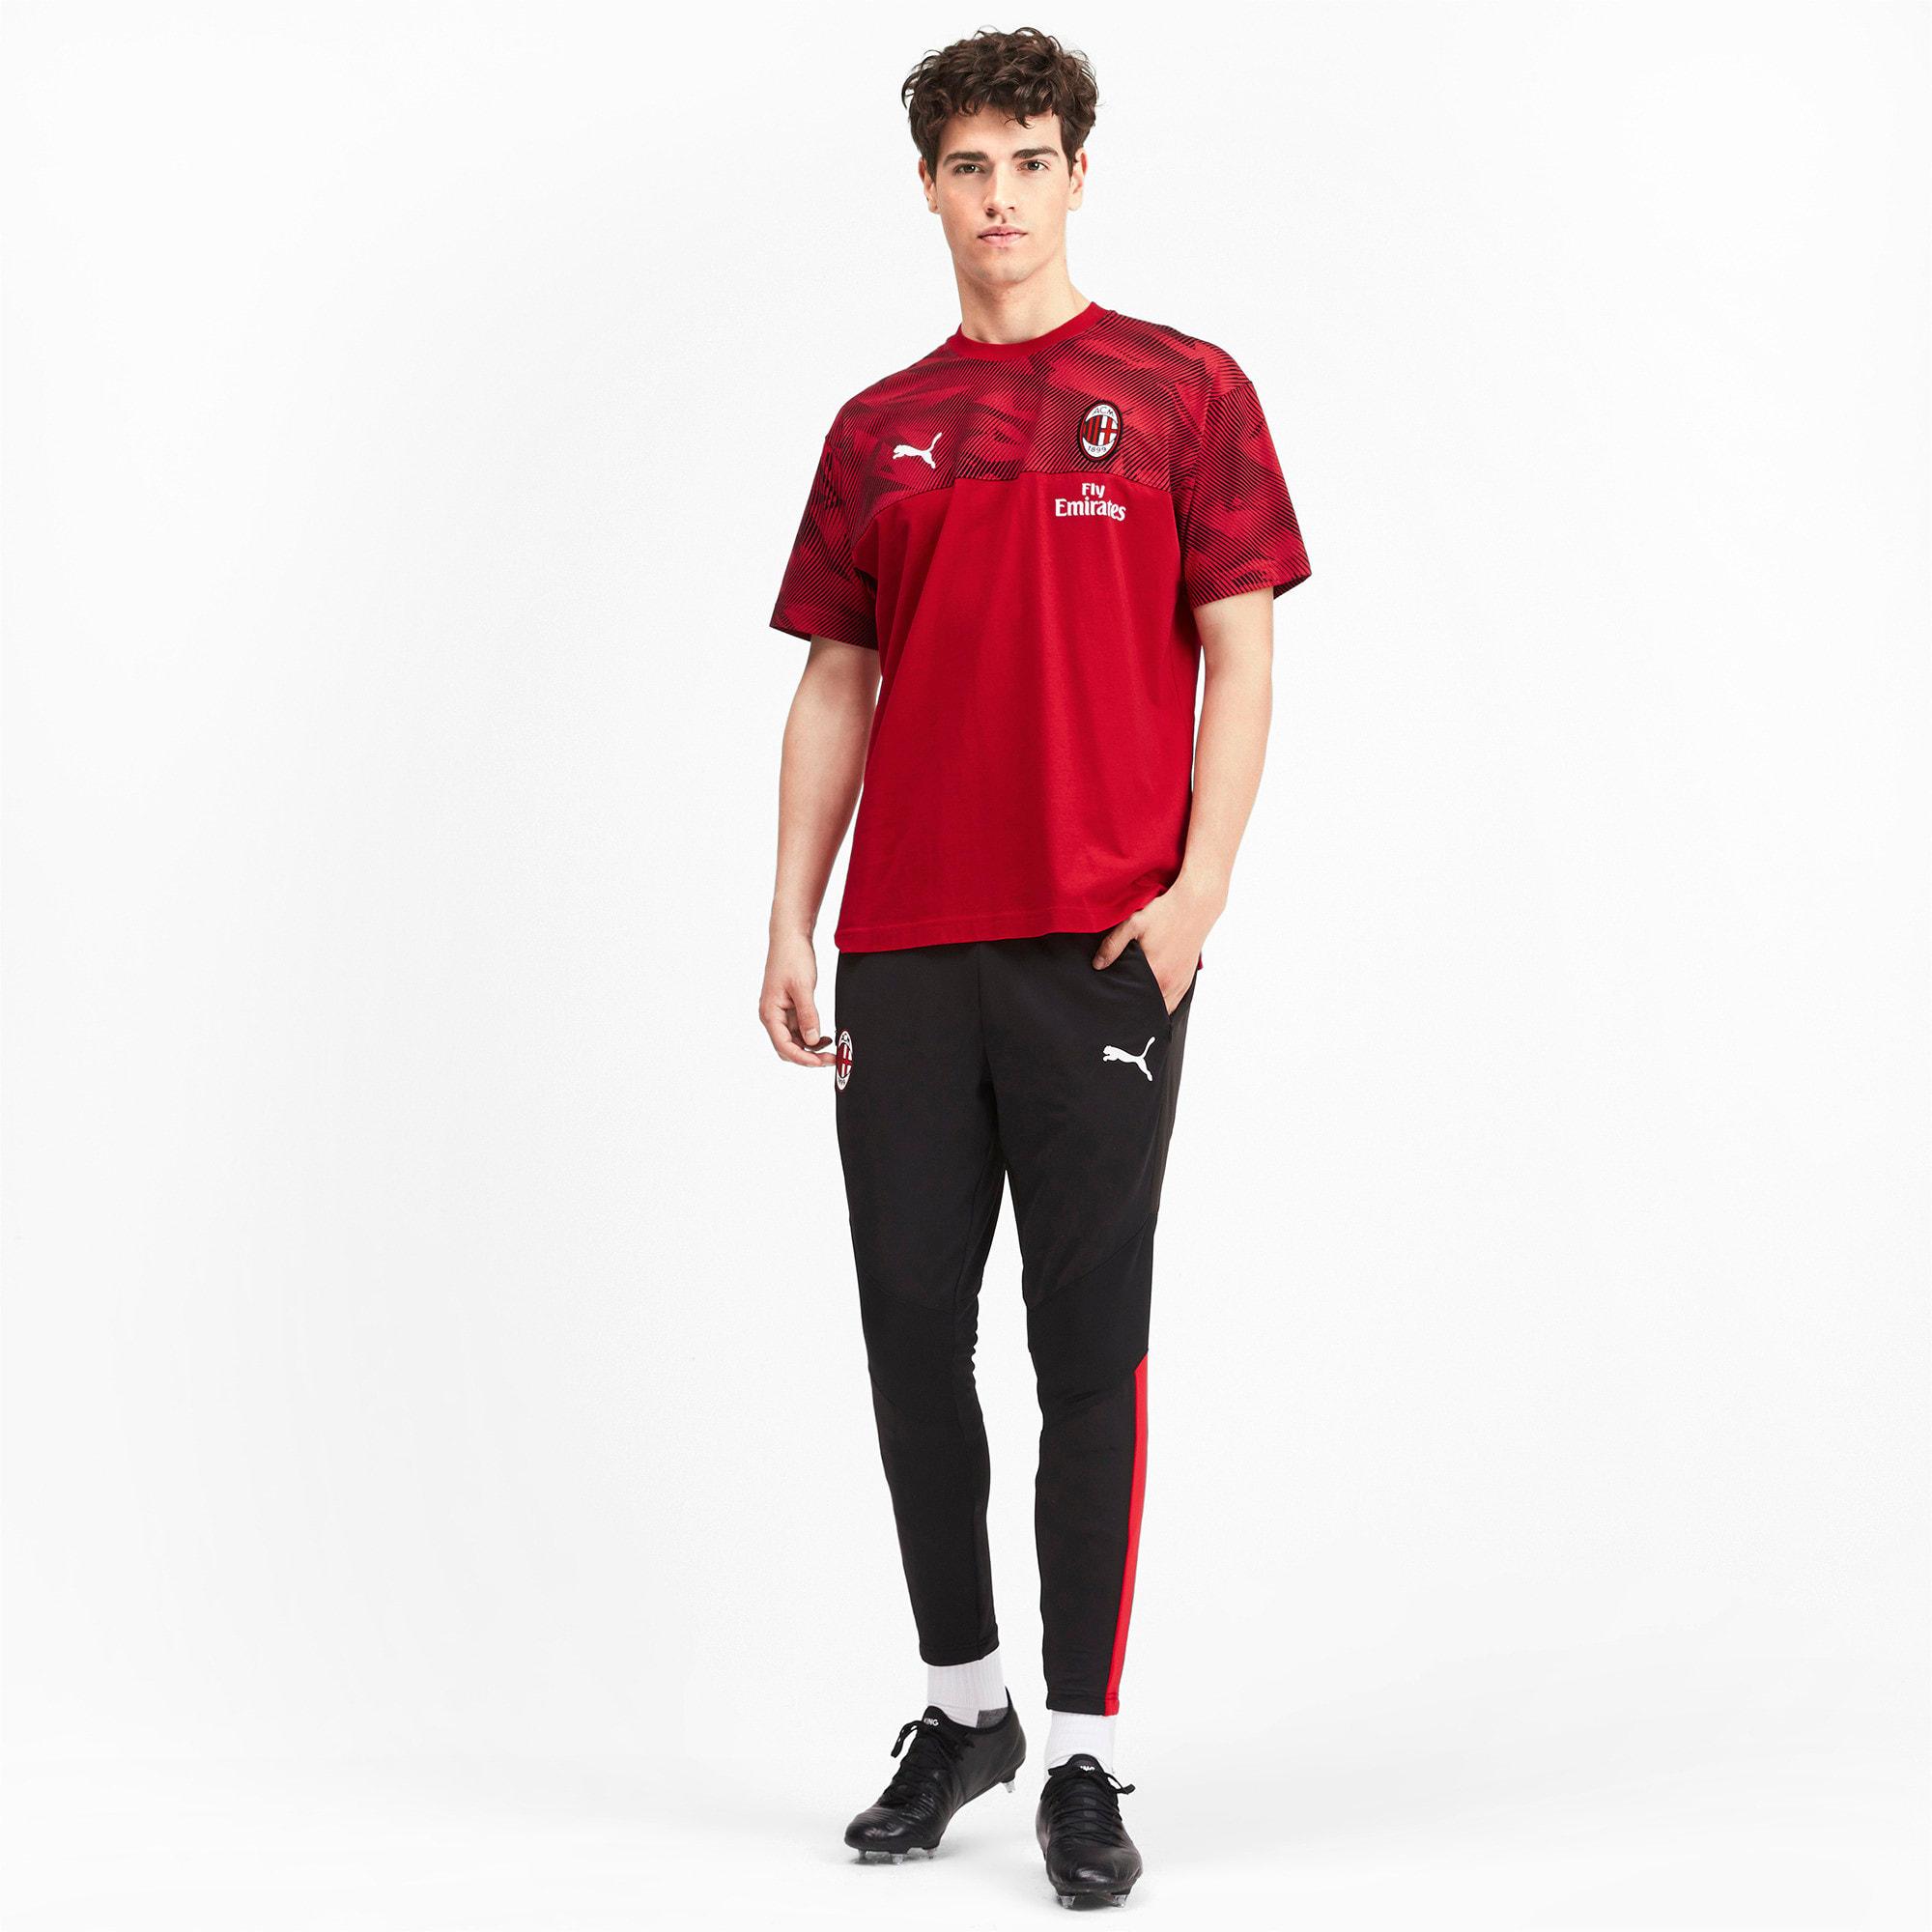 Thumbnail 3 of AC Milan Casuals Men's Tee, Tango Red -Puma Black, medium